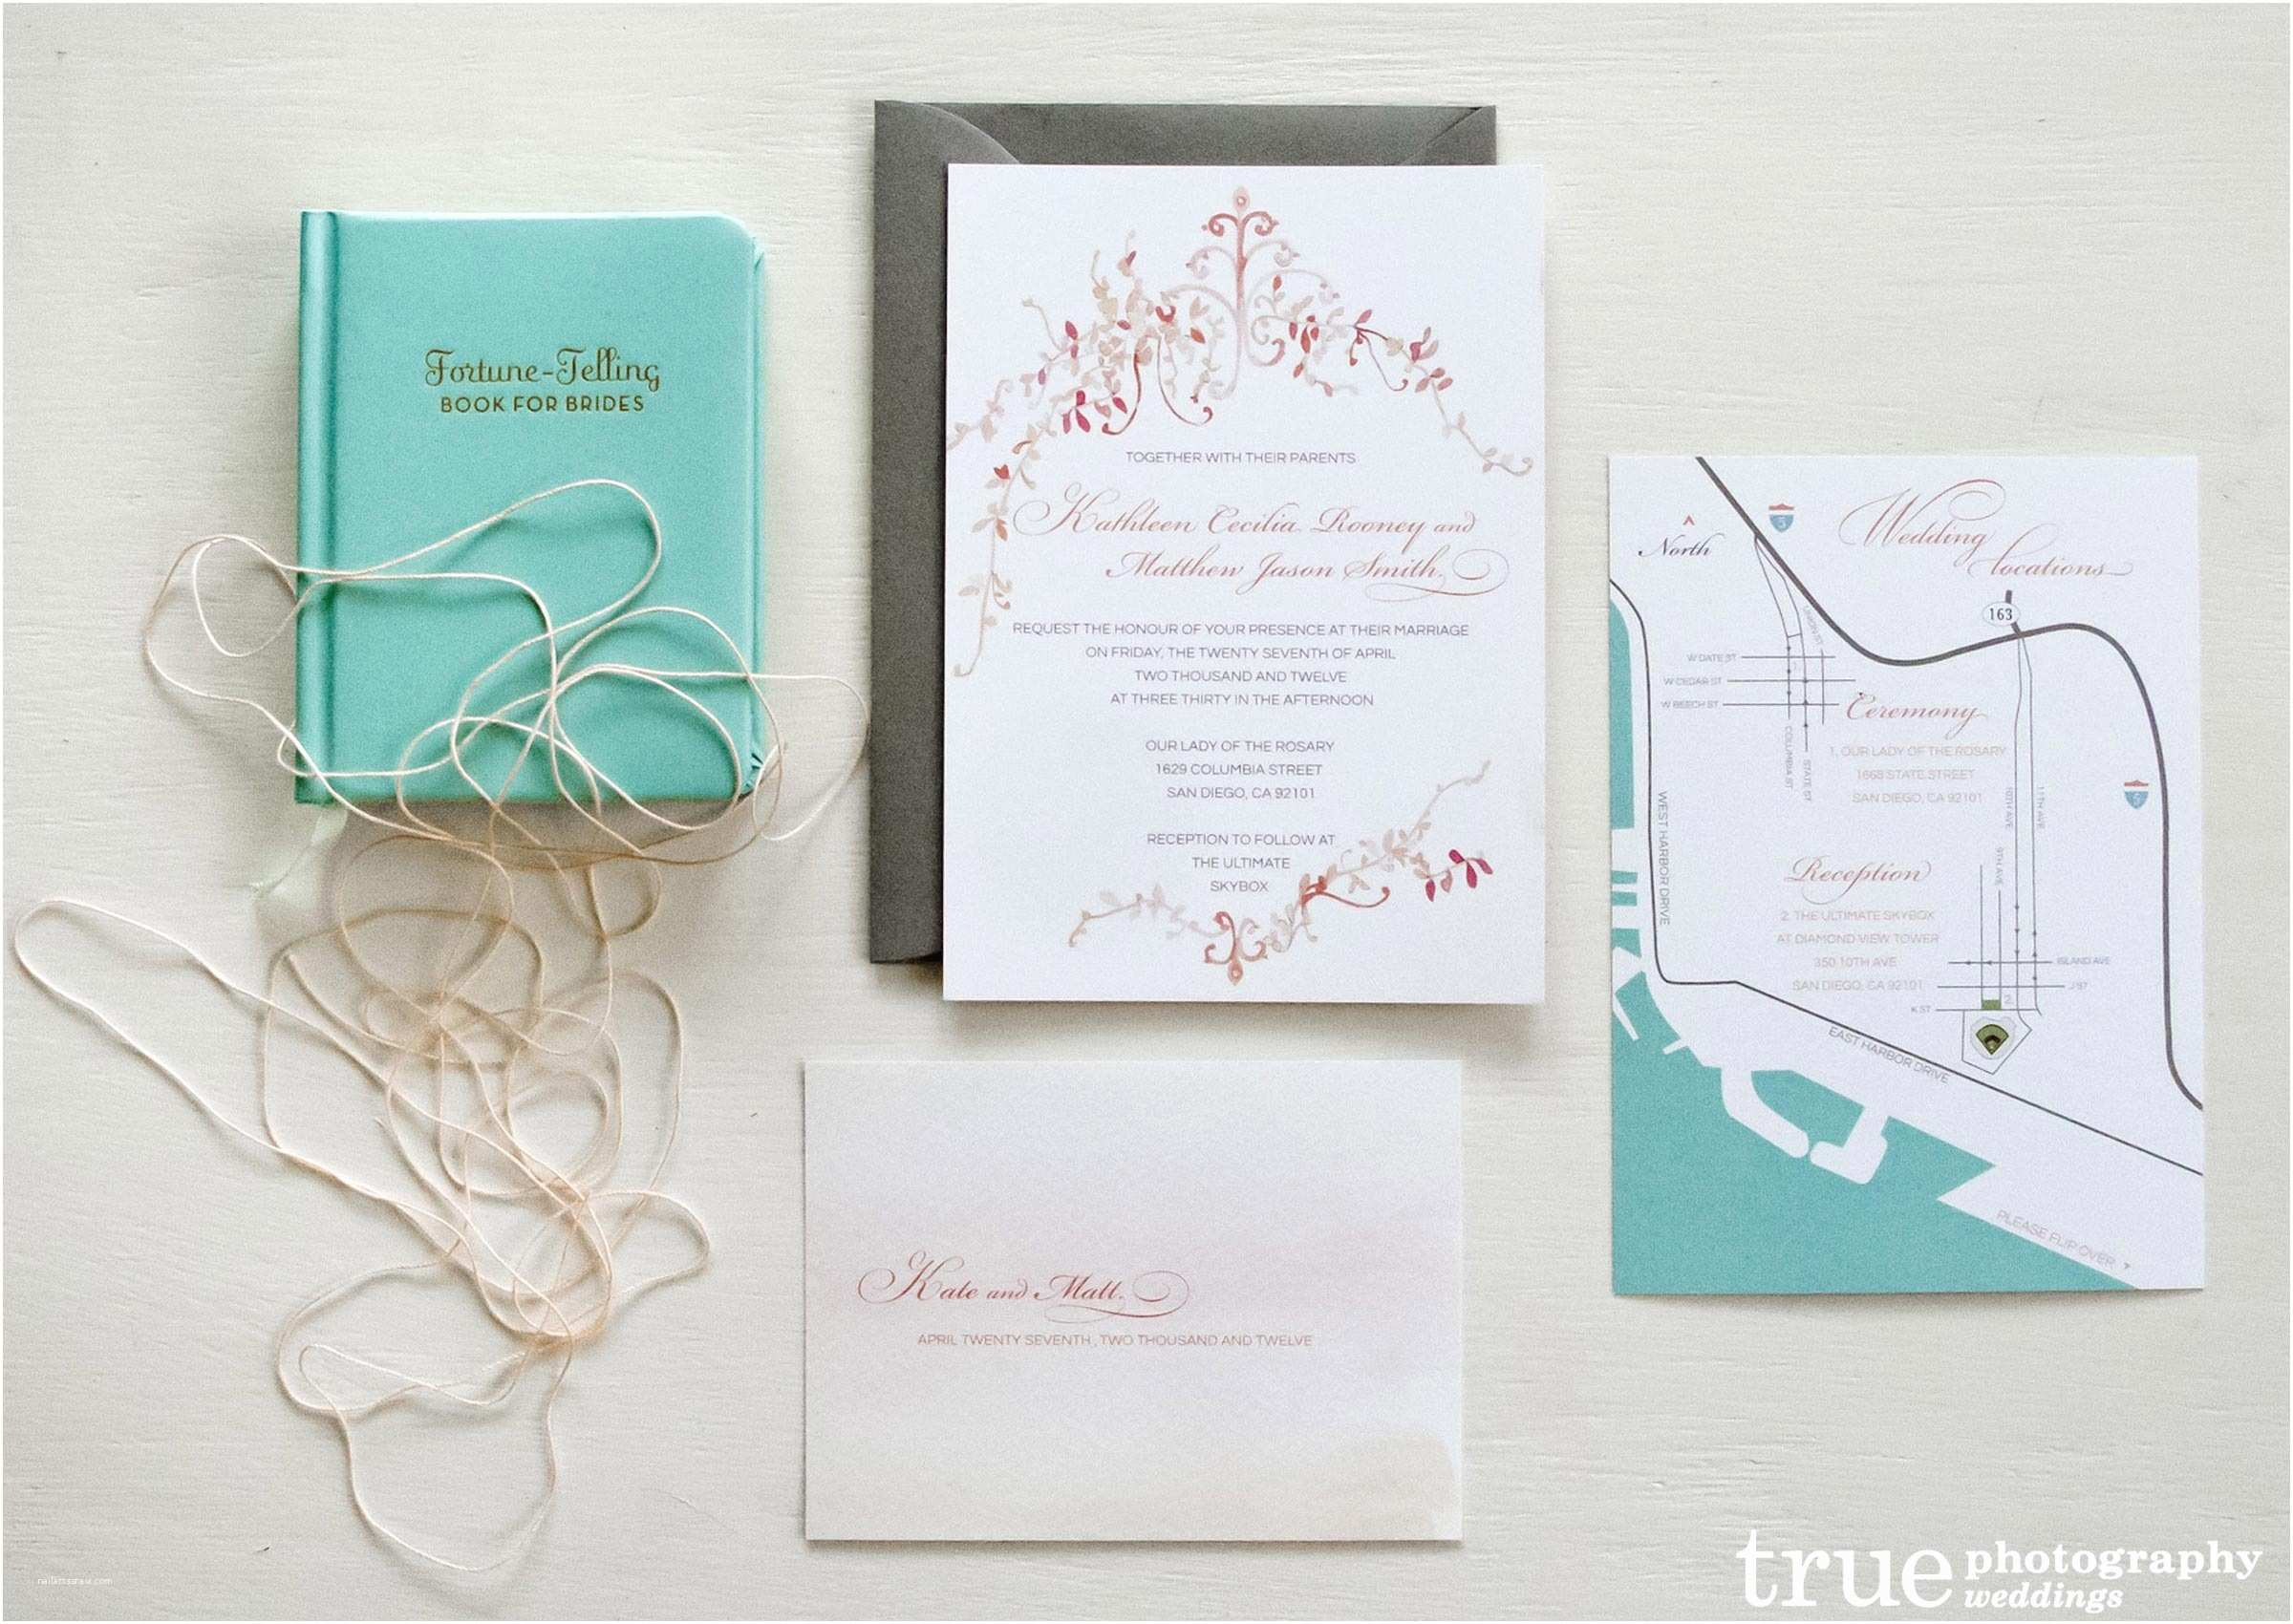 How To Design Wedding Invitations How To Make Diy Wedding Invitation Kits Ideas With